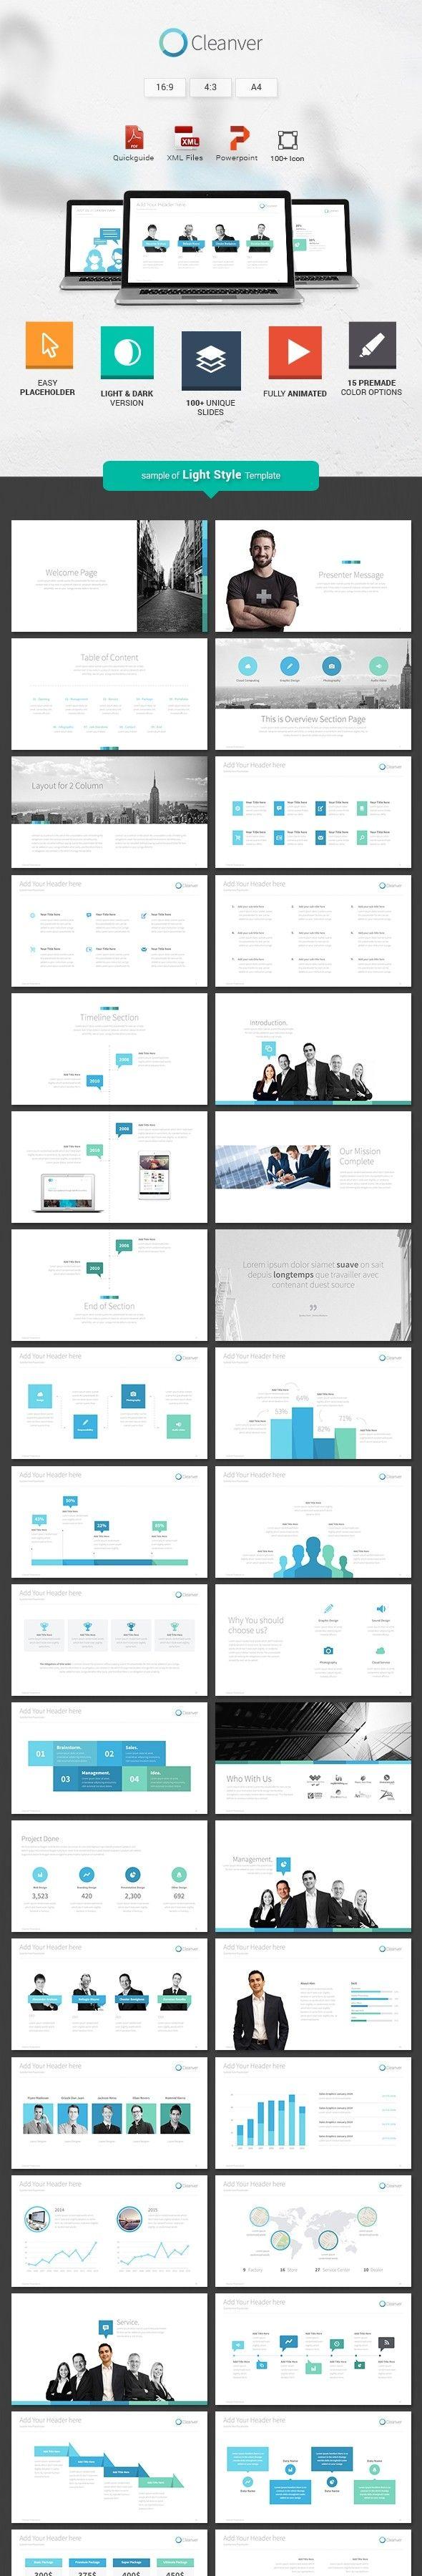 Cleanver - Clean Powerpoint Presentation | Powerpoint presentation ...